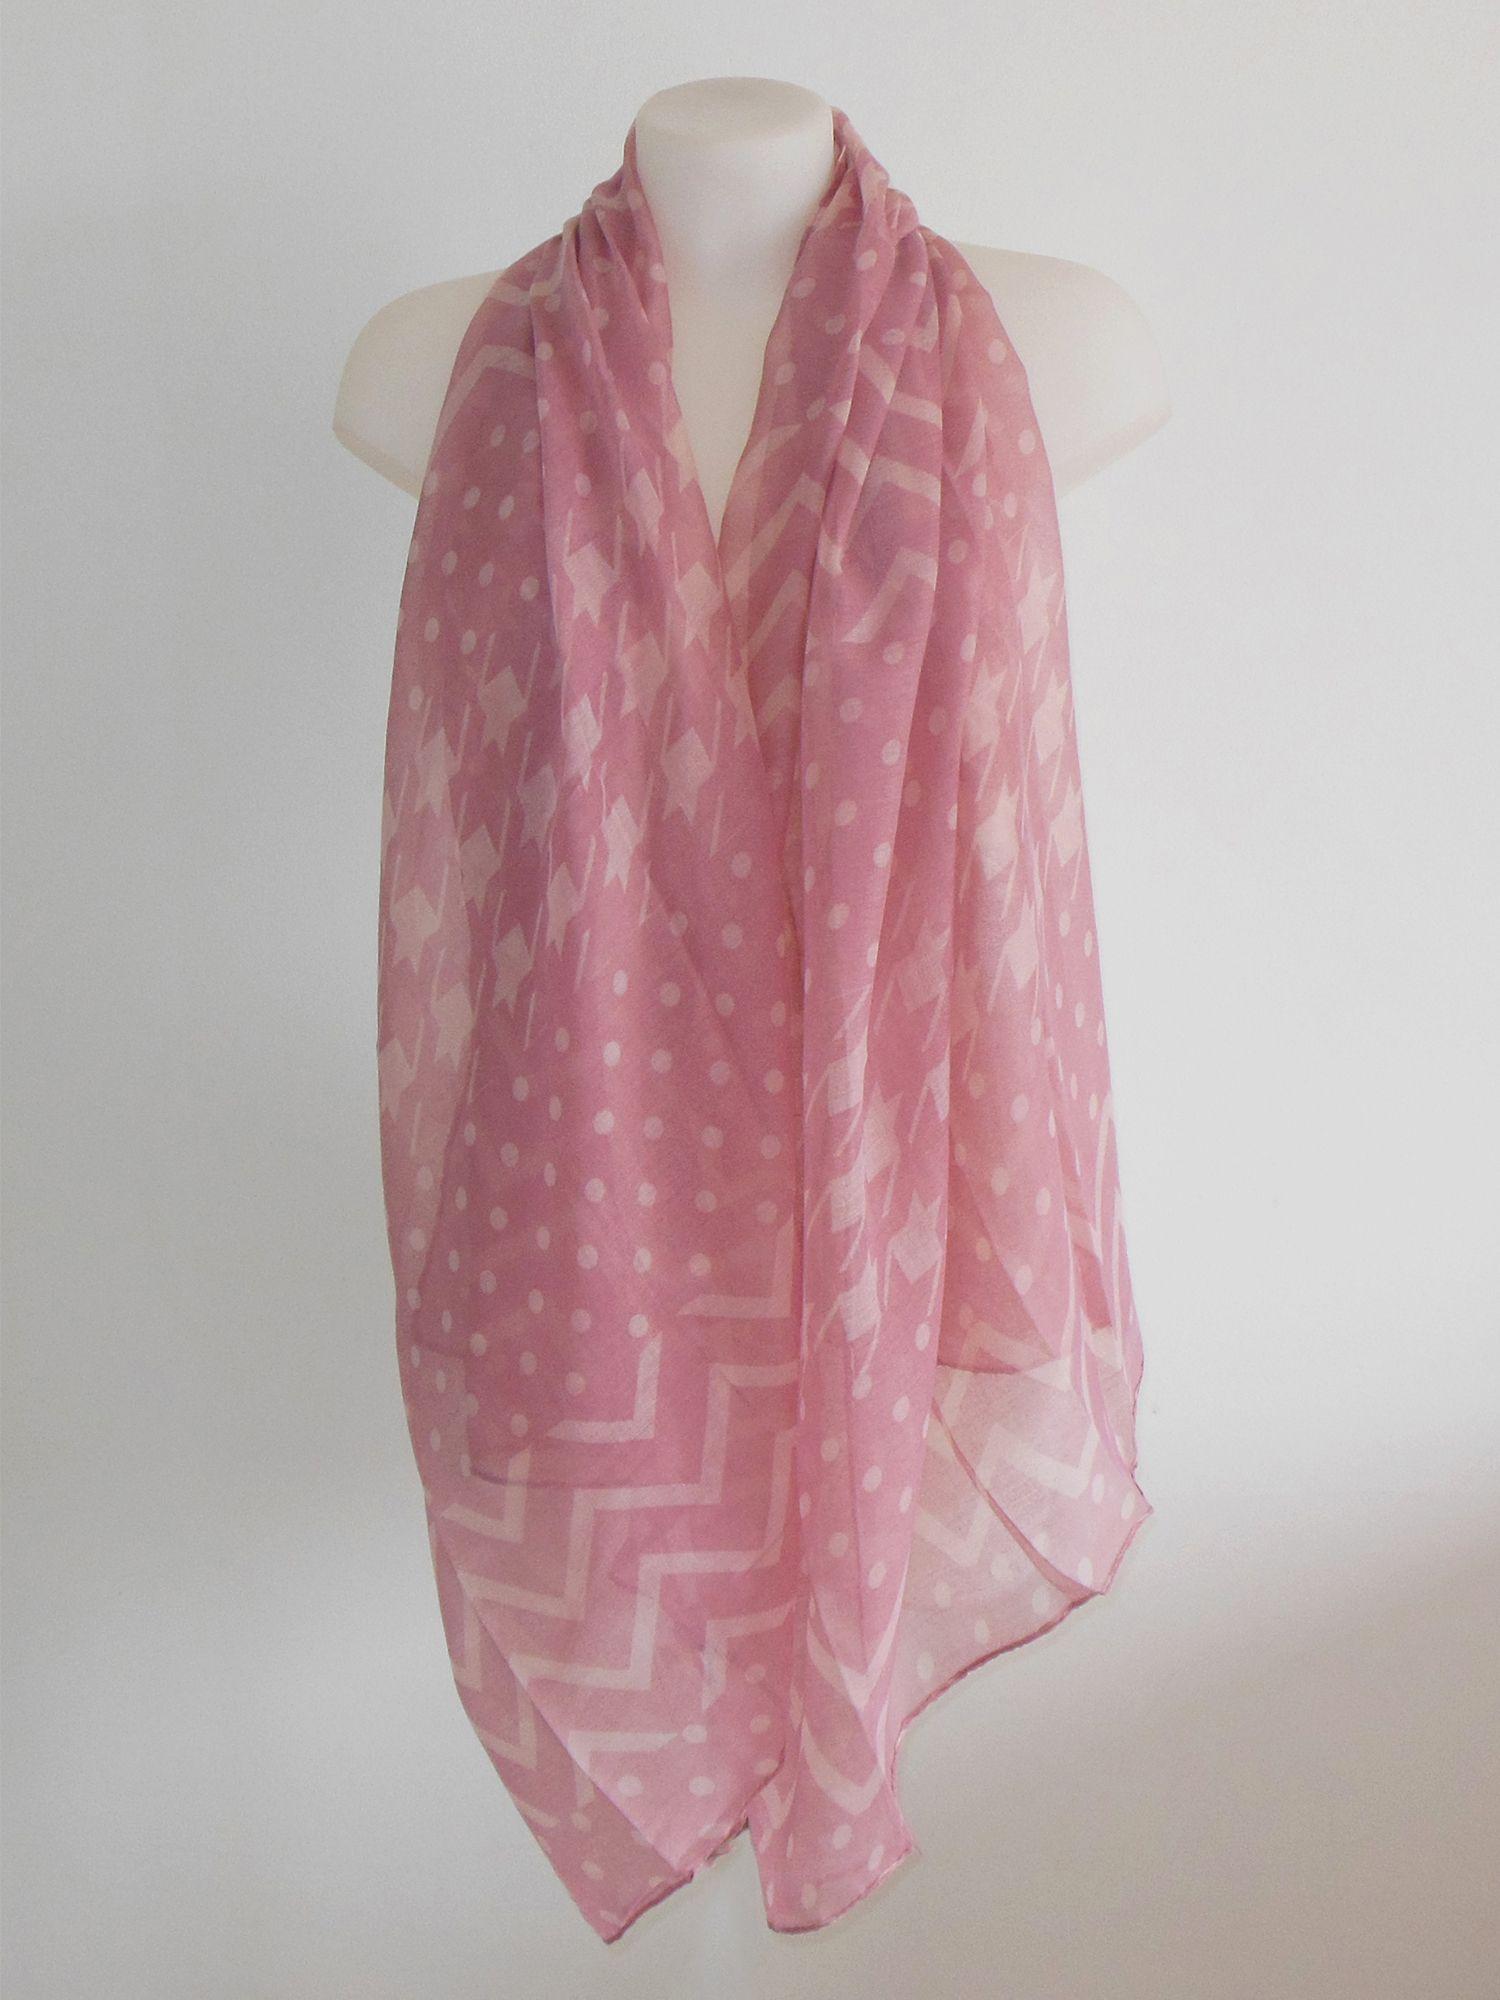 993ed0be585 Foulard rose imprimé graphique étoile  foulard  mode  tendance  fashion   milenamoda http